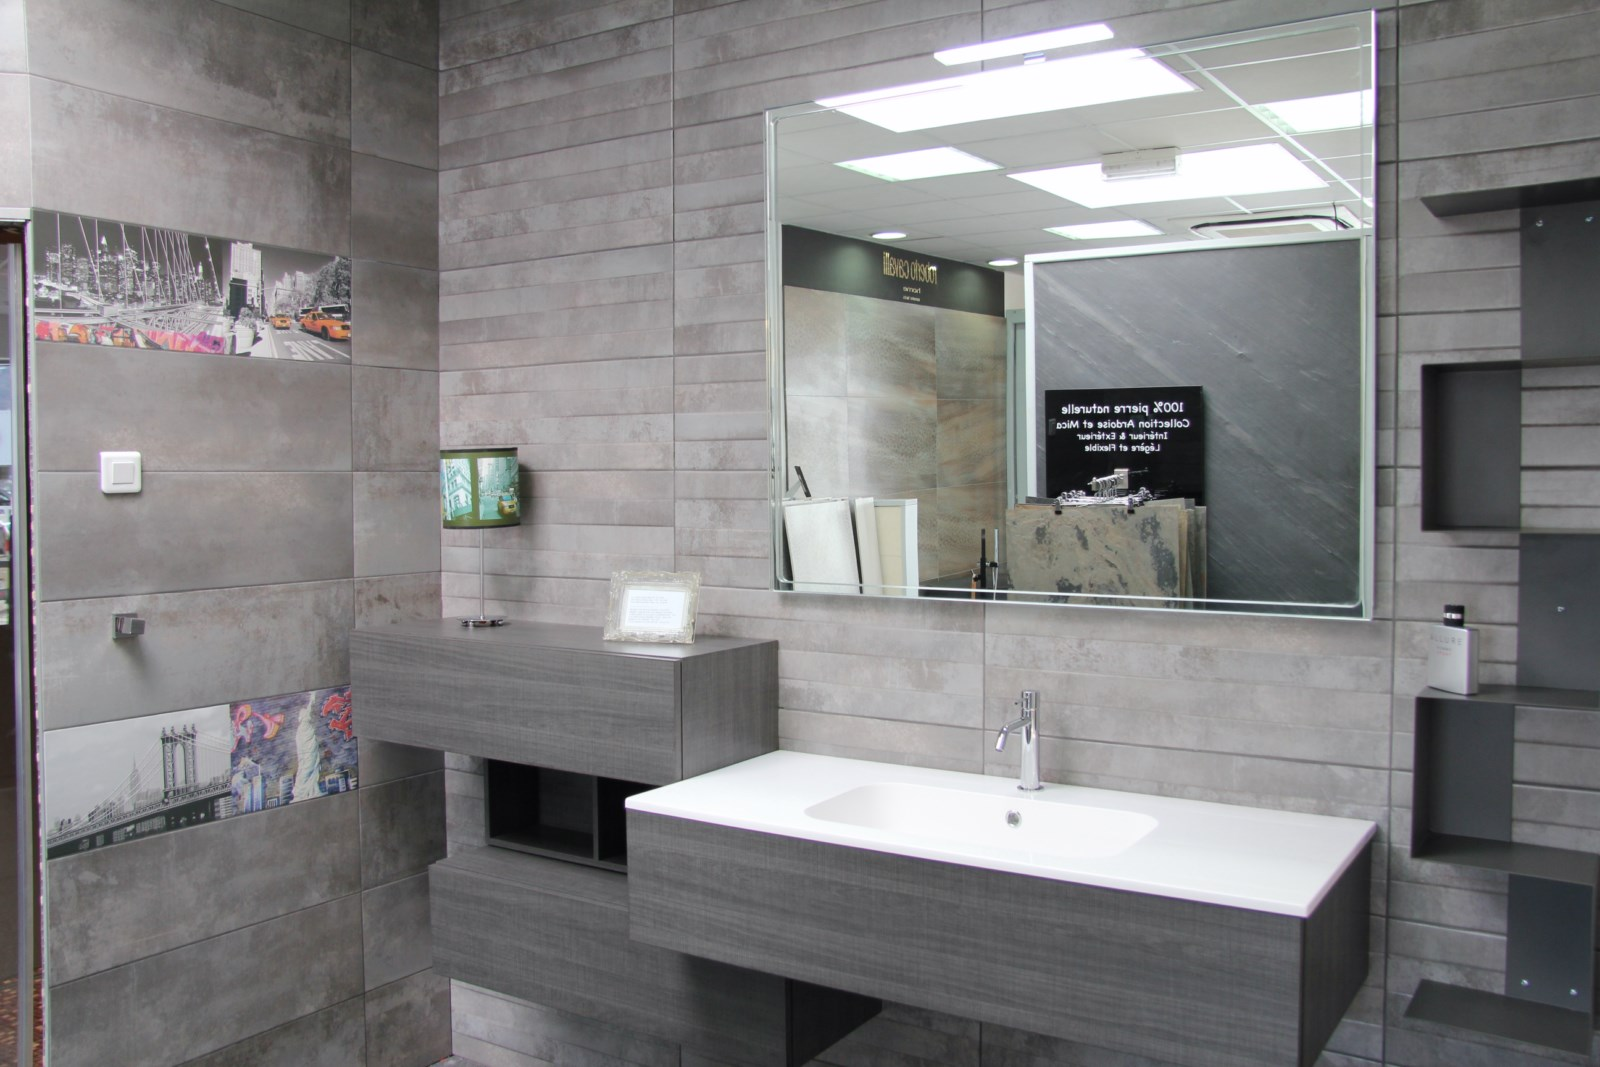 Meuble de salle de bain avec vasque integr e en r sine magasin de carrelage pierre naturelle - Salle de bain resine ...